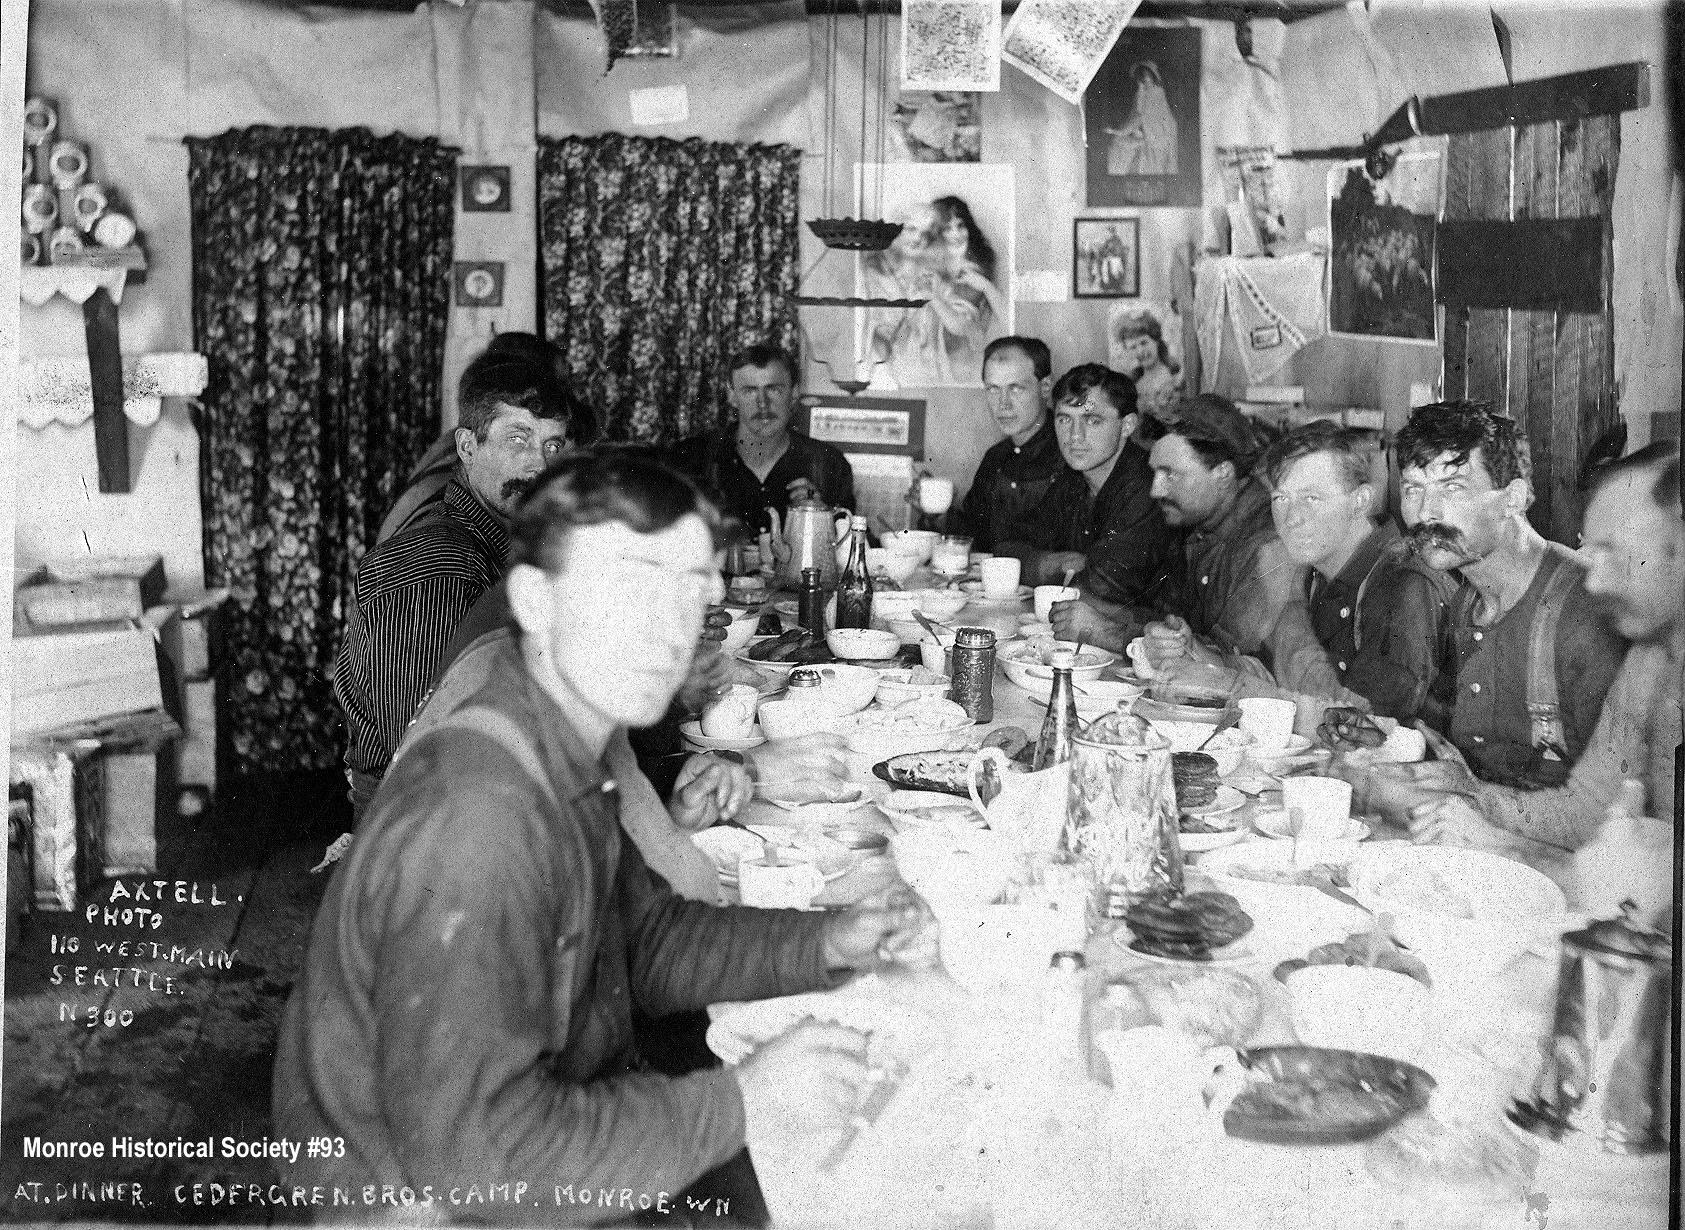 0093 – At dinner, Cedergreen Bros. Camp, Monroe